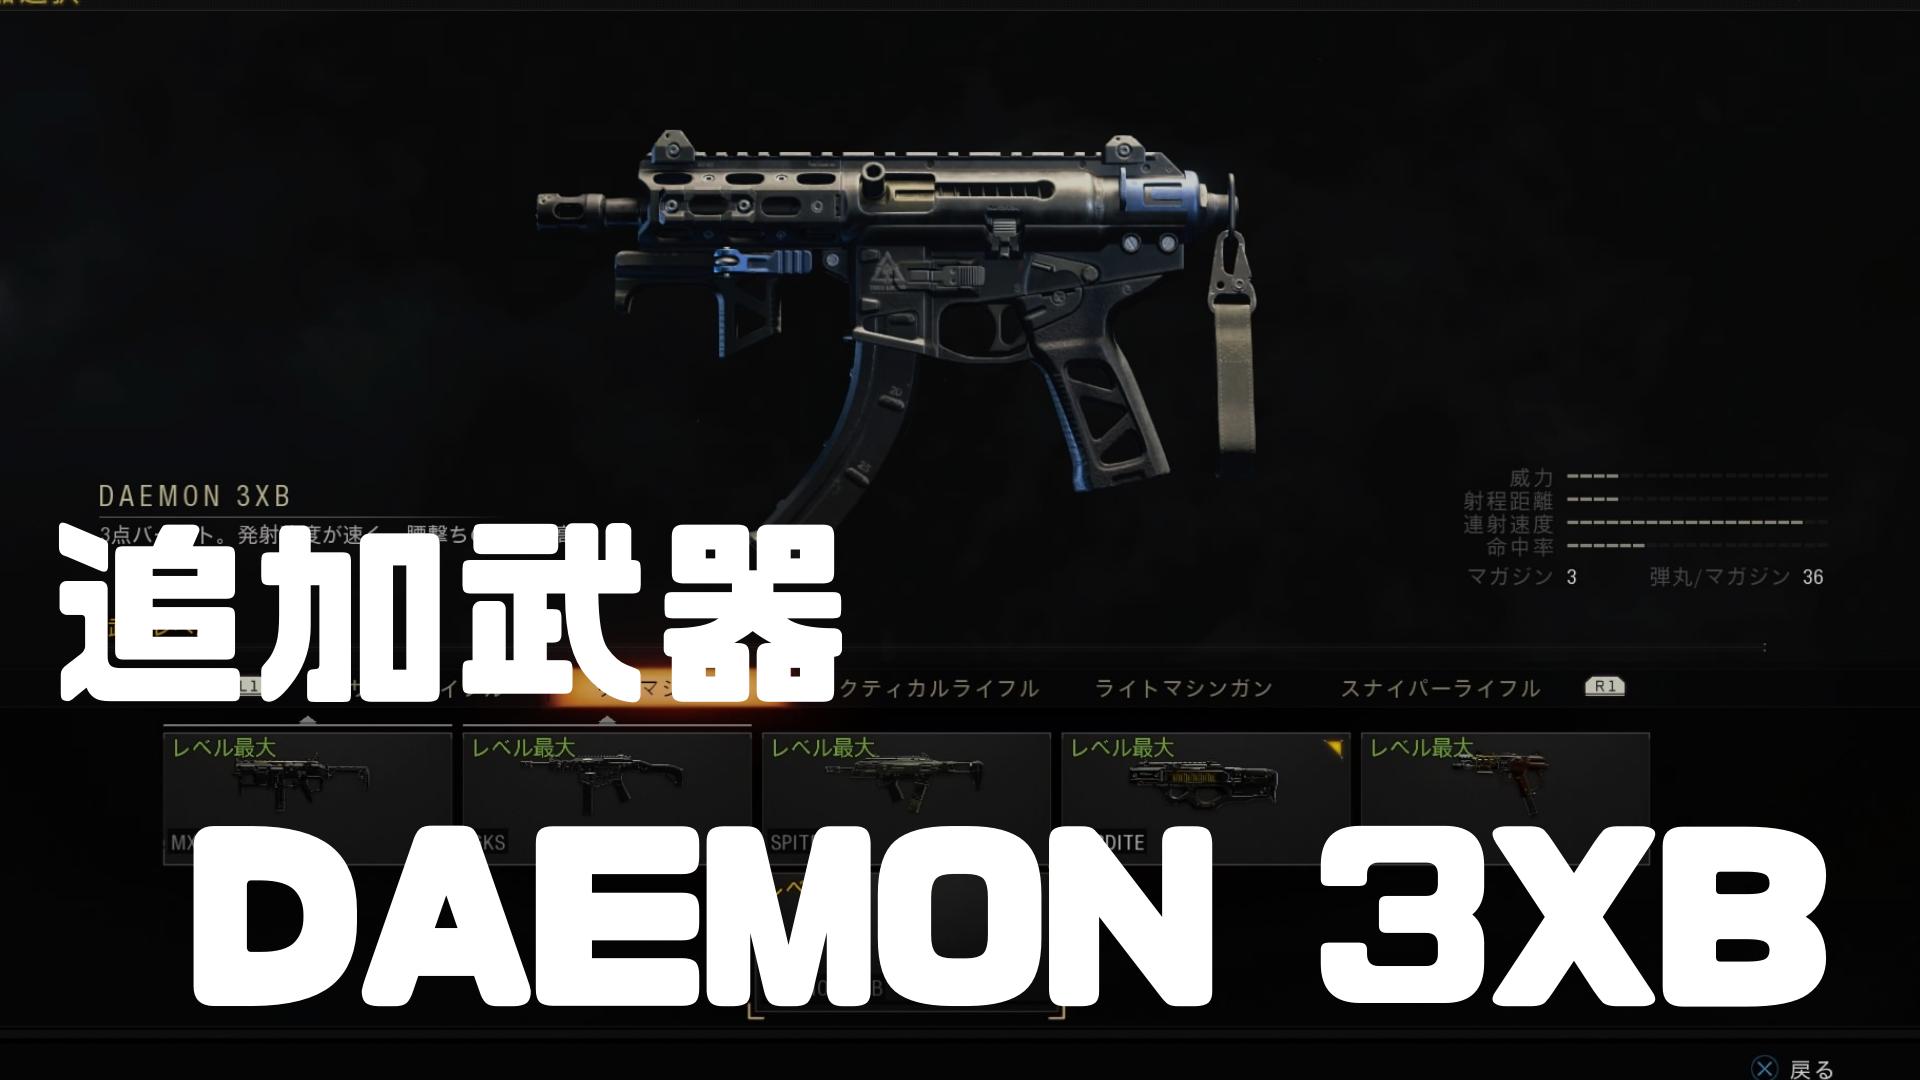 【BO4】3点バーストSMG DAEMON 3XBの性能